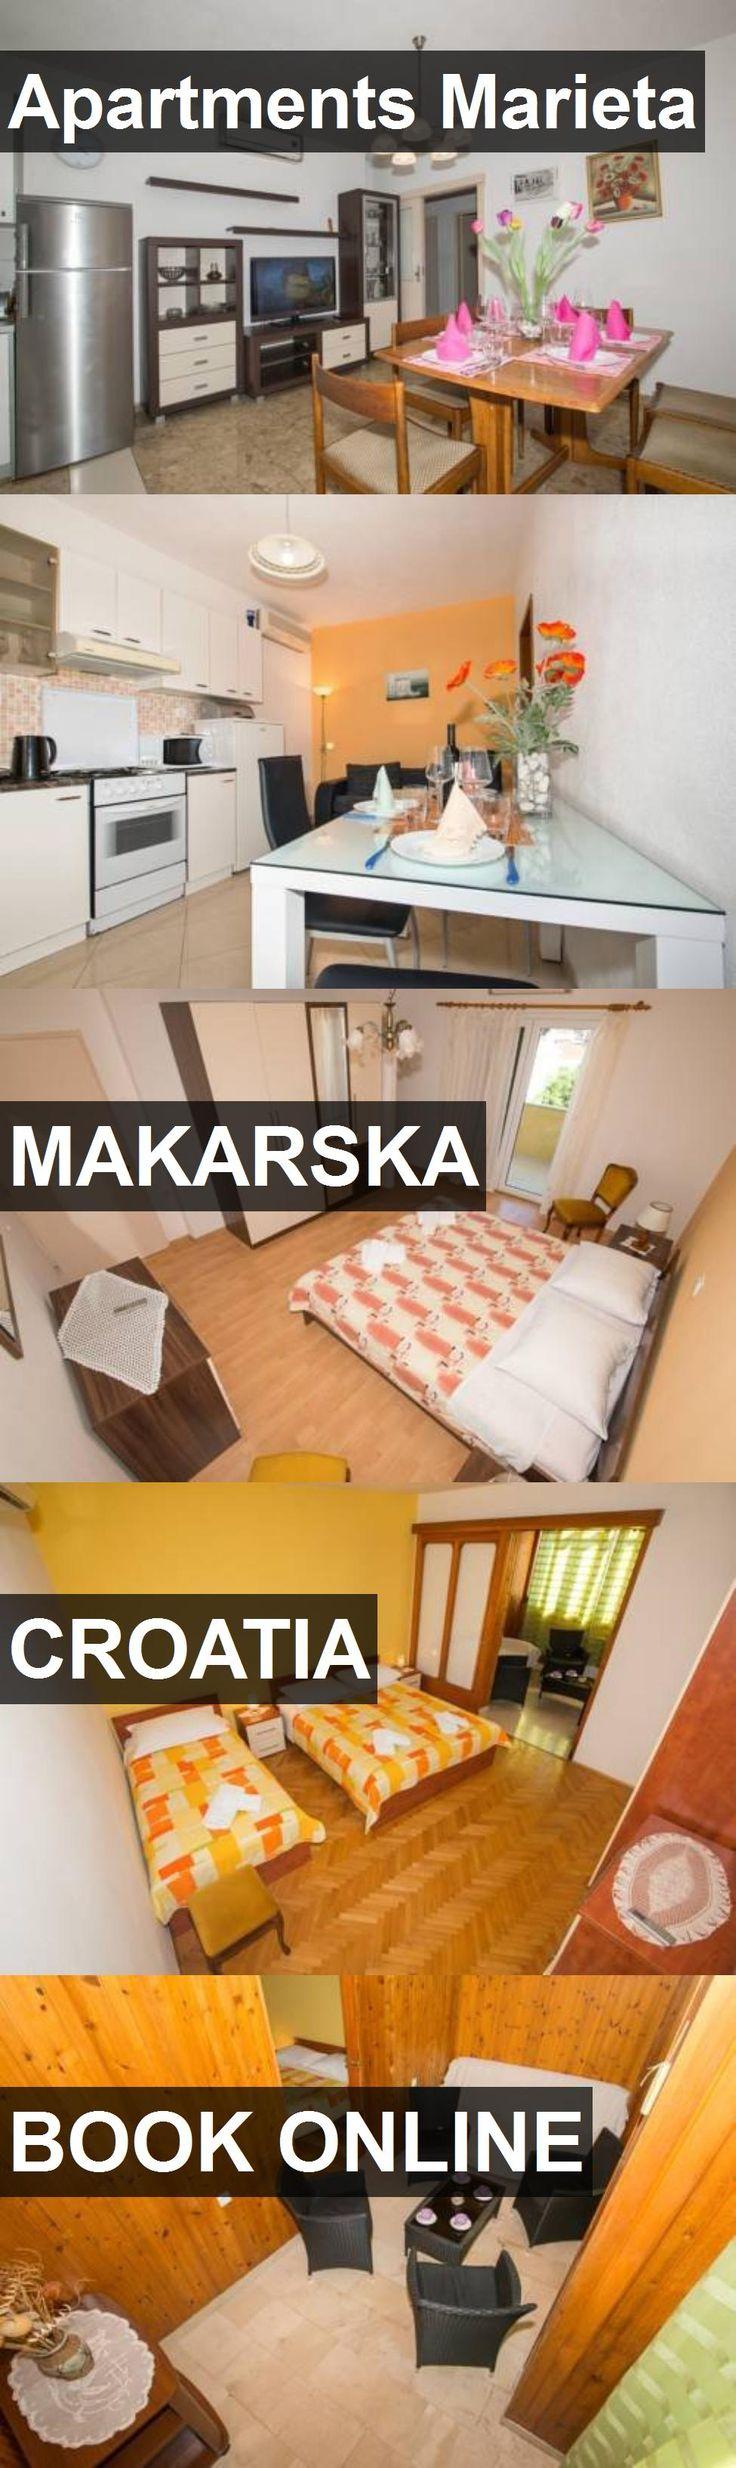 Apartments Marieta in Makarska, Croatia. For more information, photos, reviews and best prices please follow the link. #Croatia #Makarska #travel #vacation #apartment